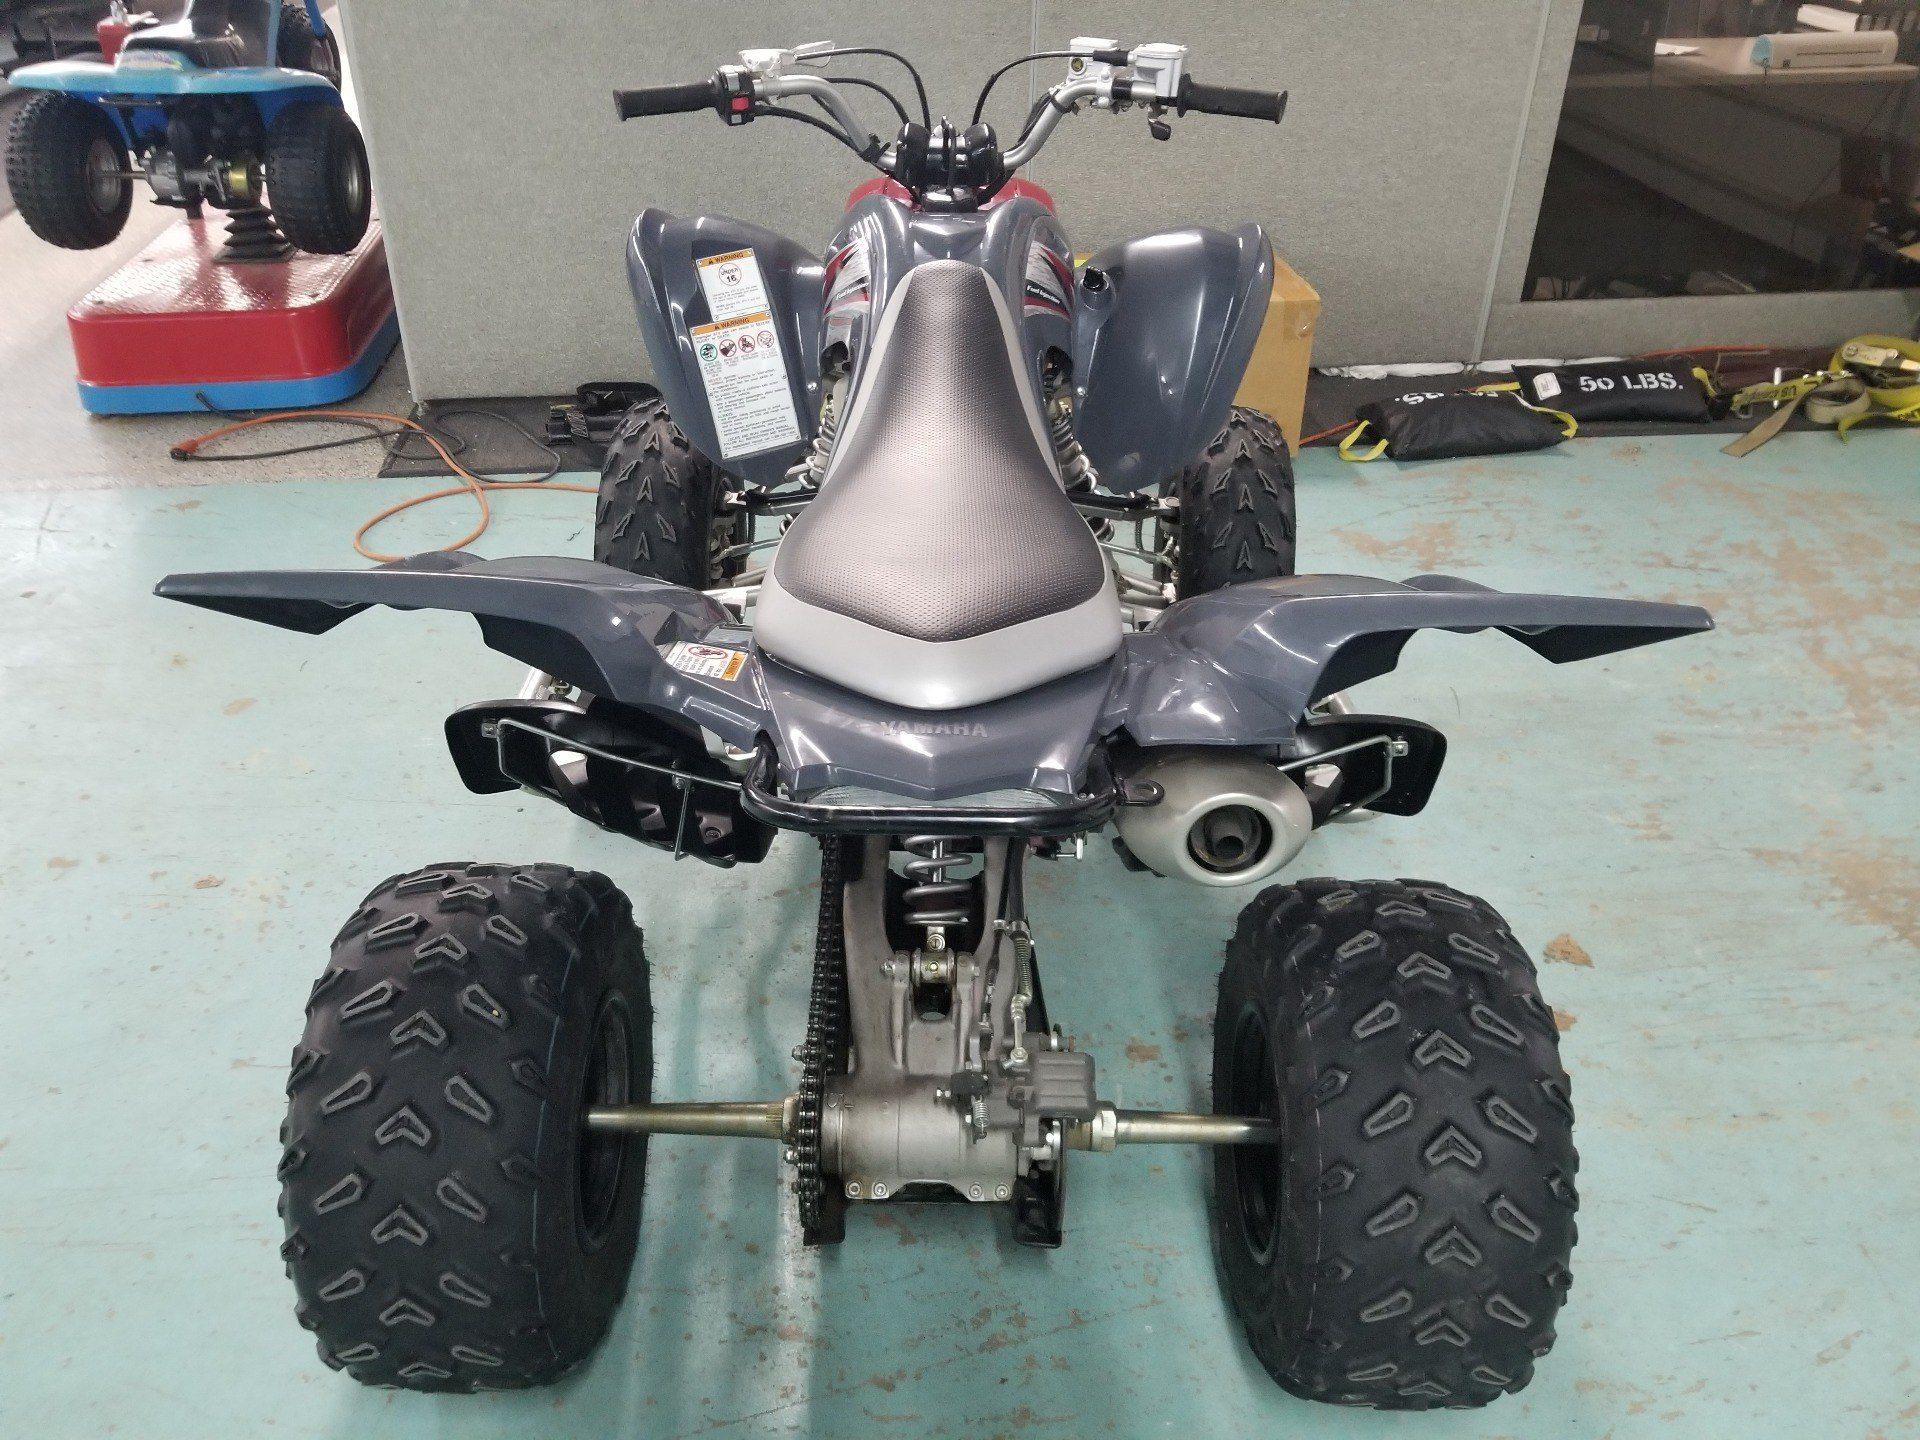 2008 Yamaha Raptor 700R 6